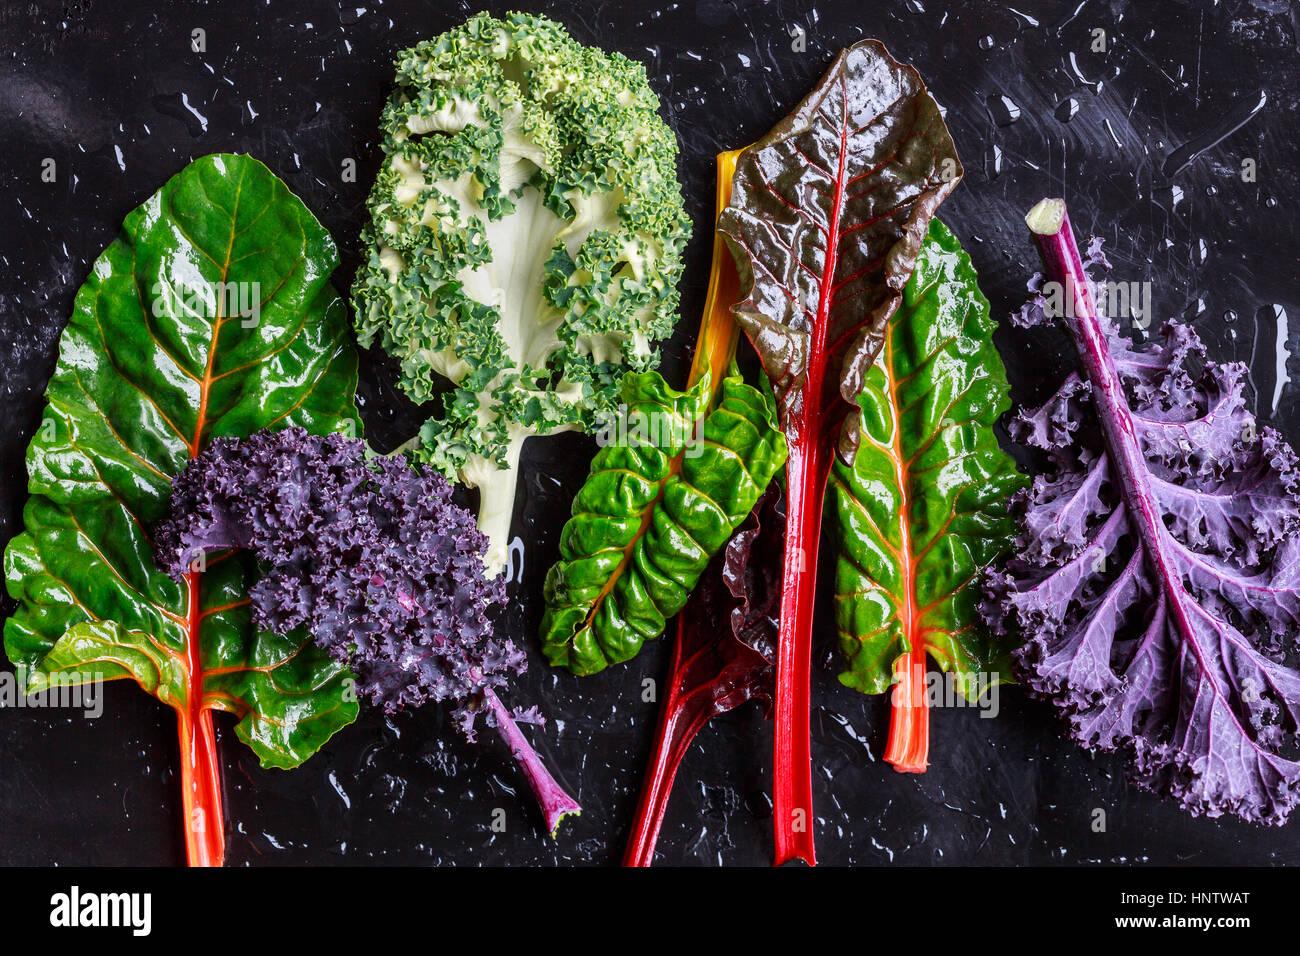 Púrpura y acelgas Kale Imagen De Stock